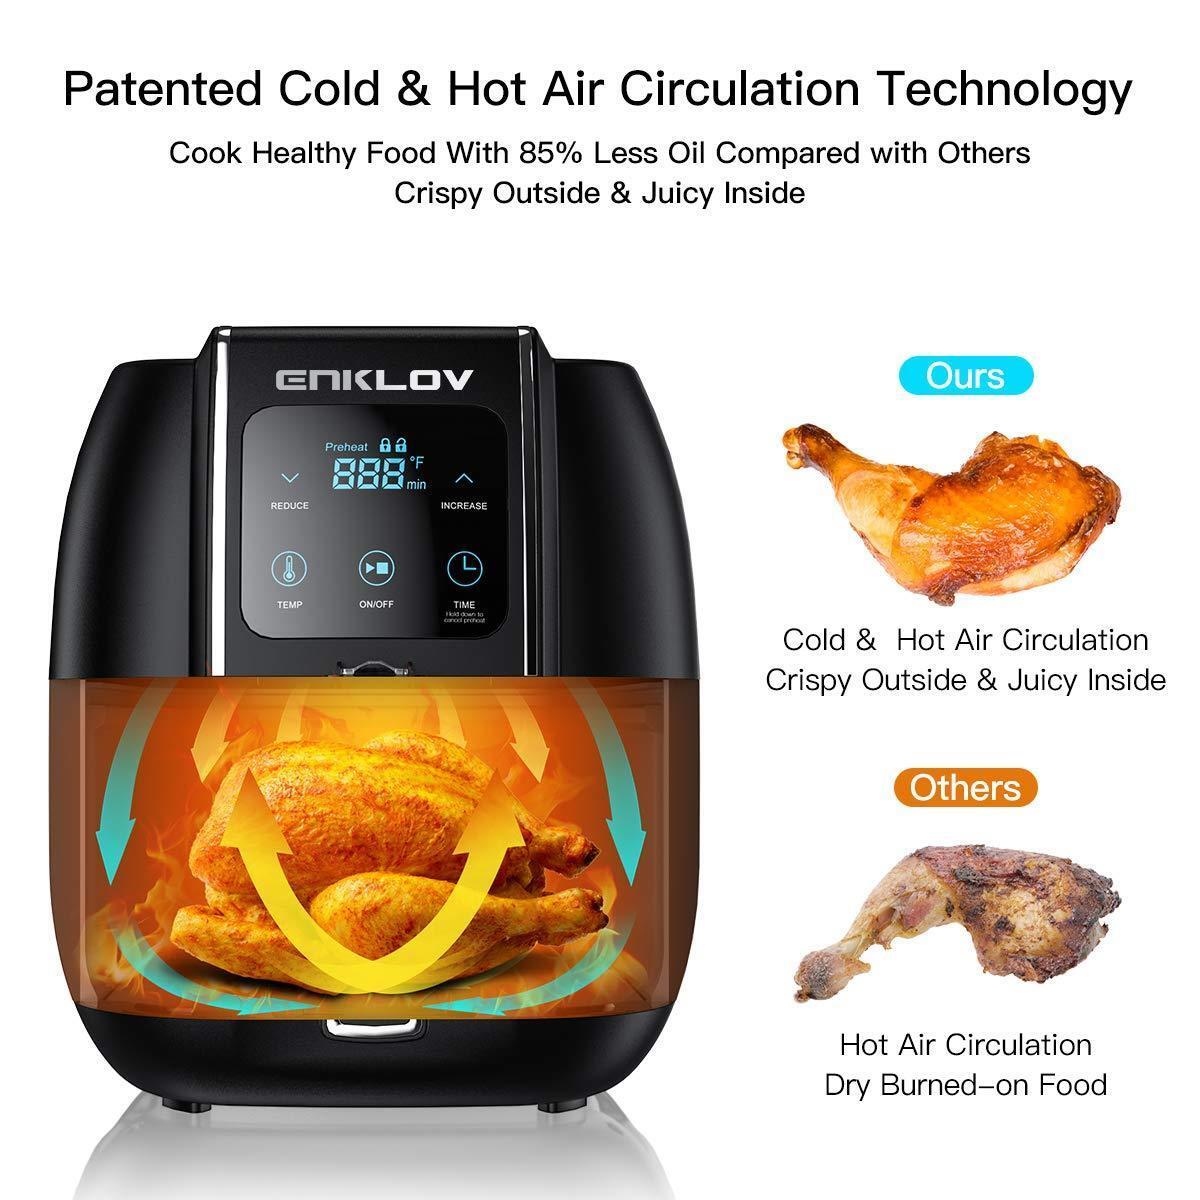 Enklov 8 in 1 Power Air Fryer Oven 1350W Precise Temperature-Controlled XL 5.5QT